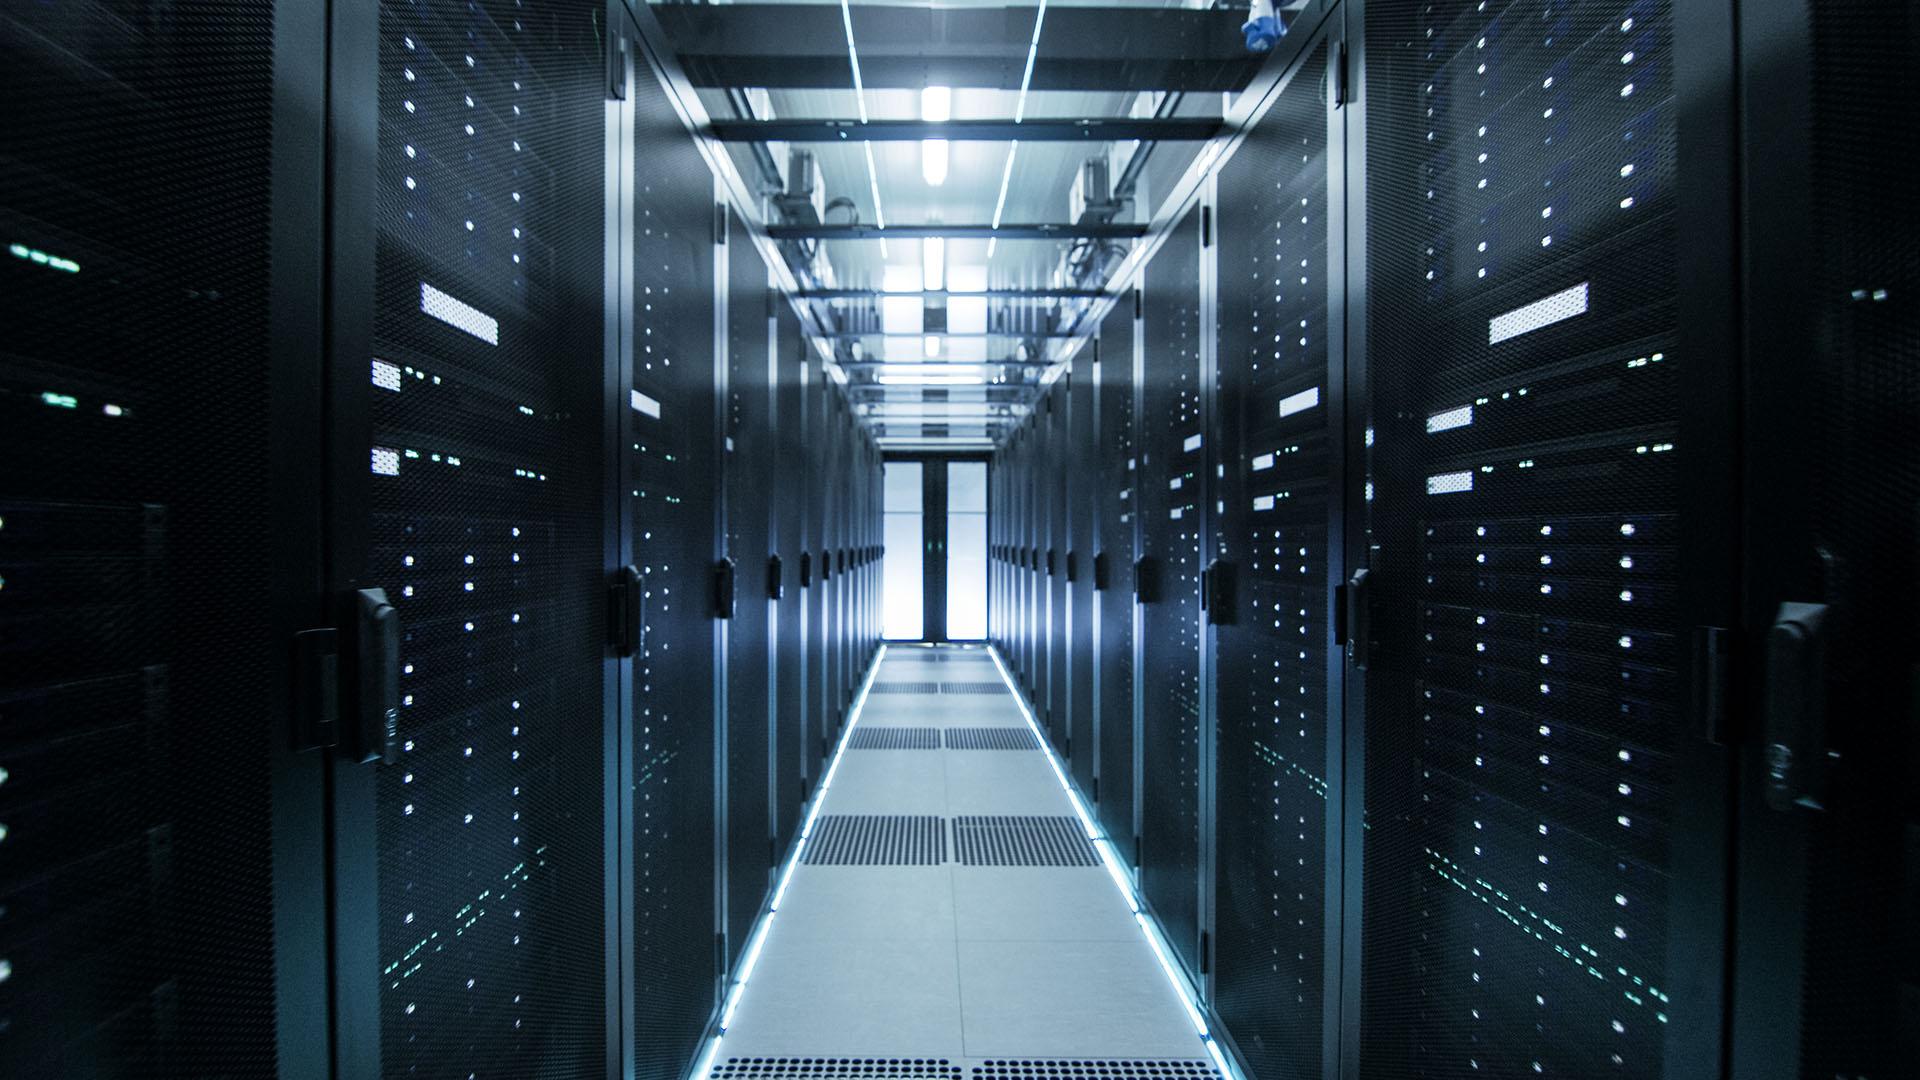 Developing digital infrastructure: The next frontier